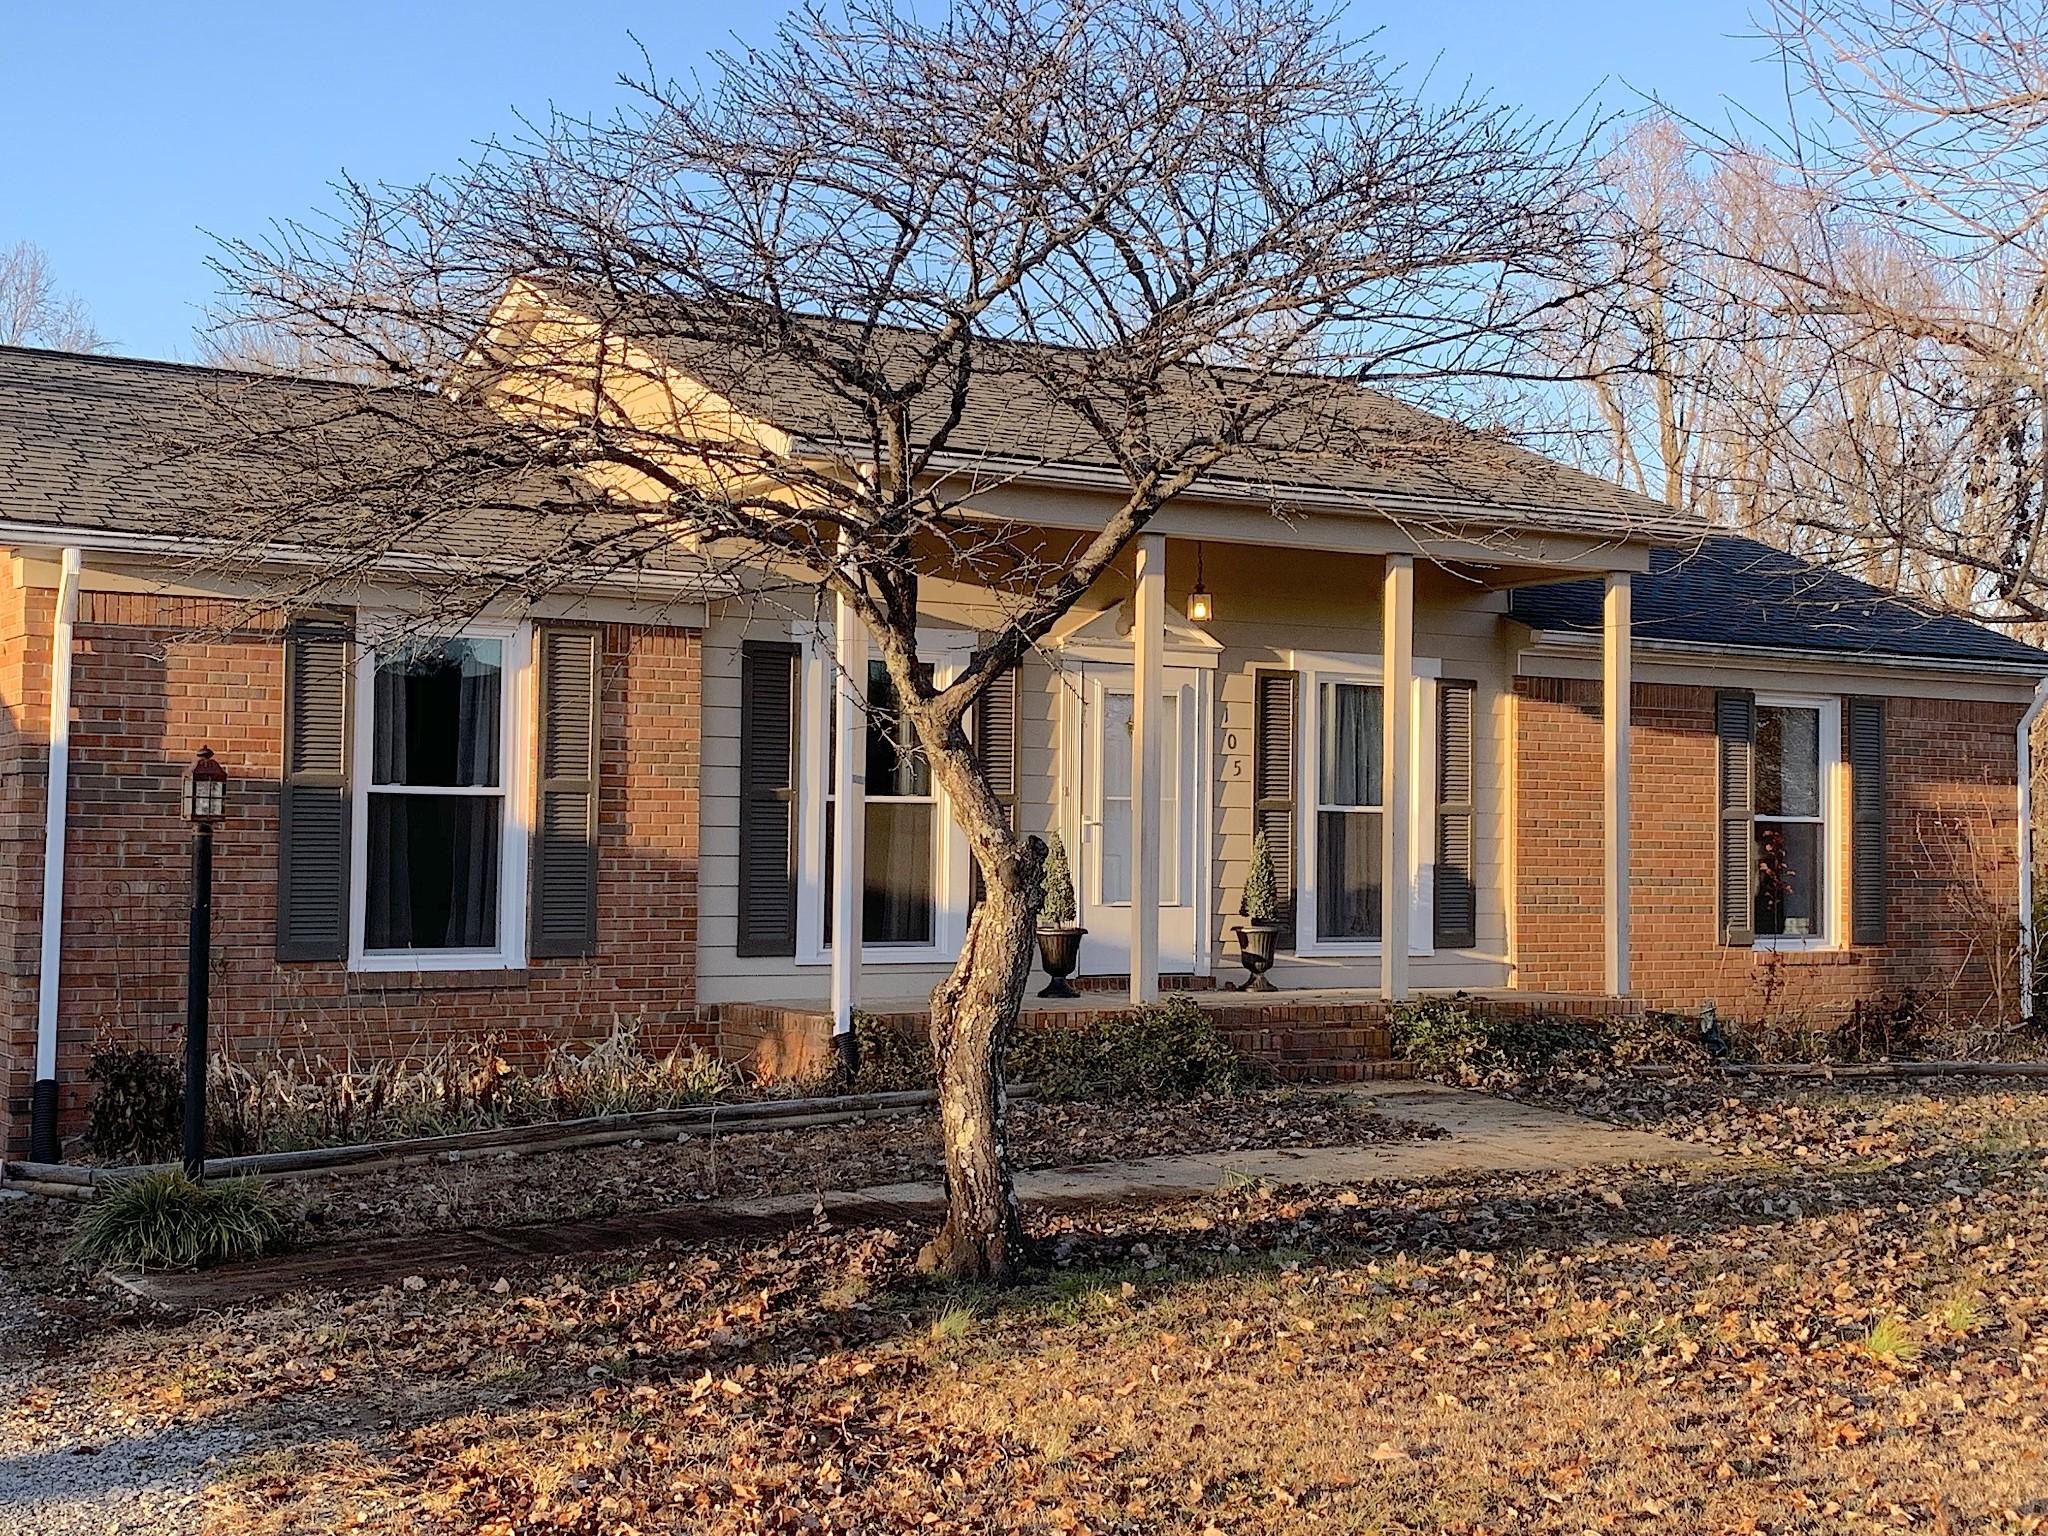 105 Ashland Dr, Ashland City, TN 37015 - Ashland City, TN real estate listing